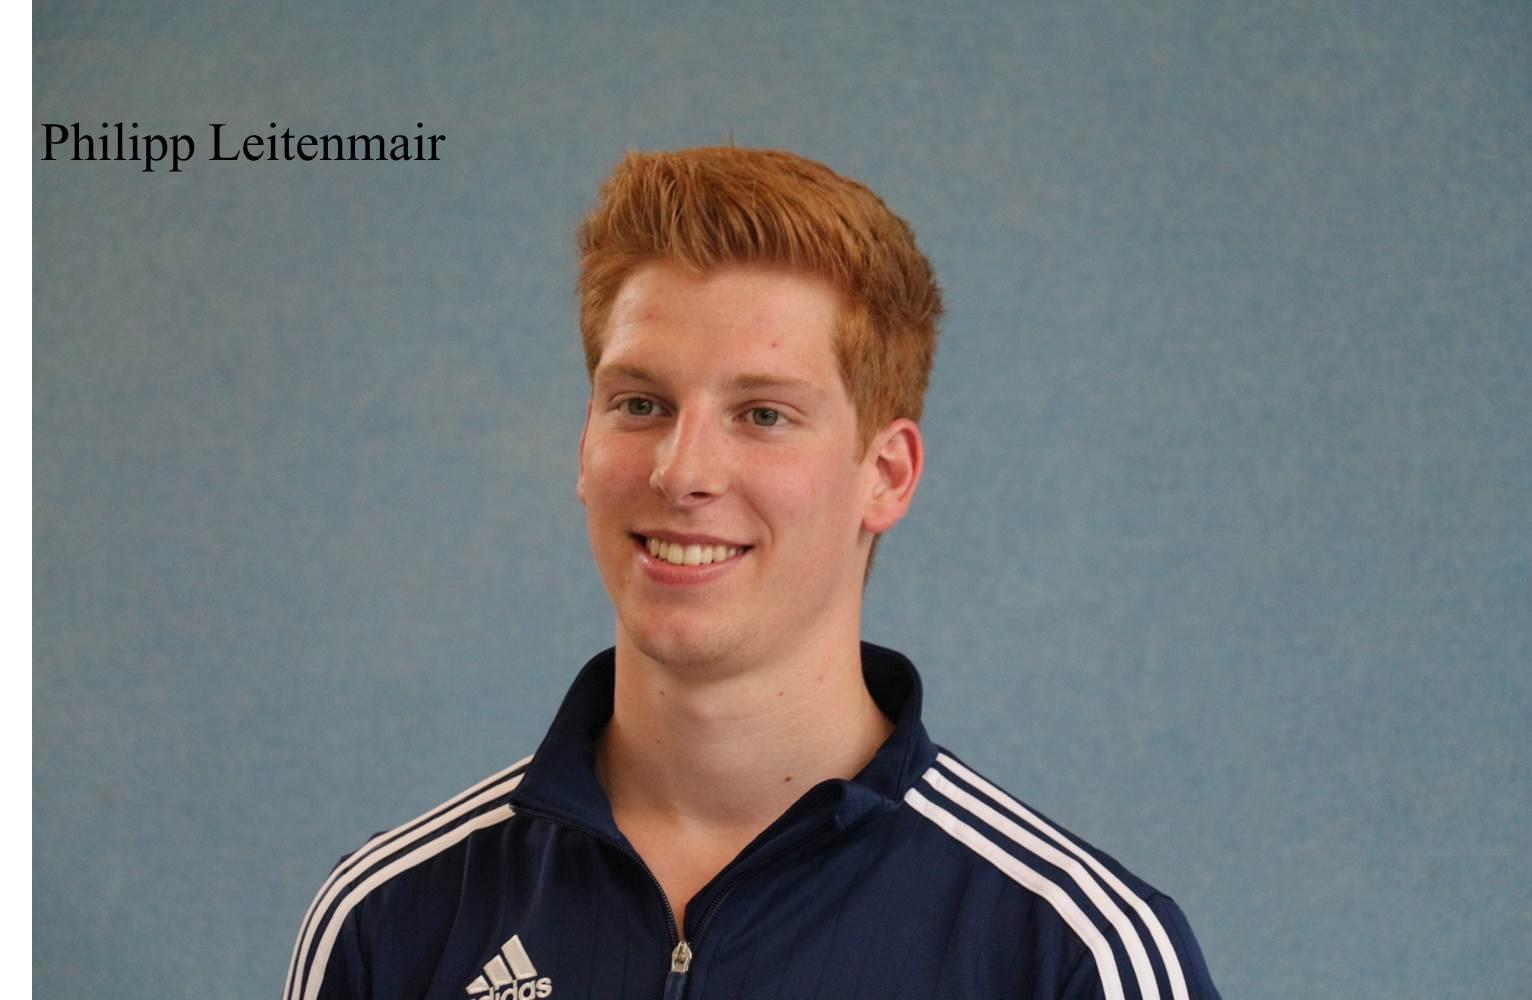 Philipp Leitenmair